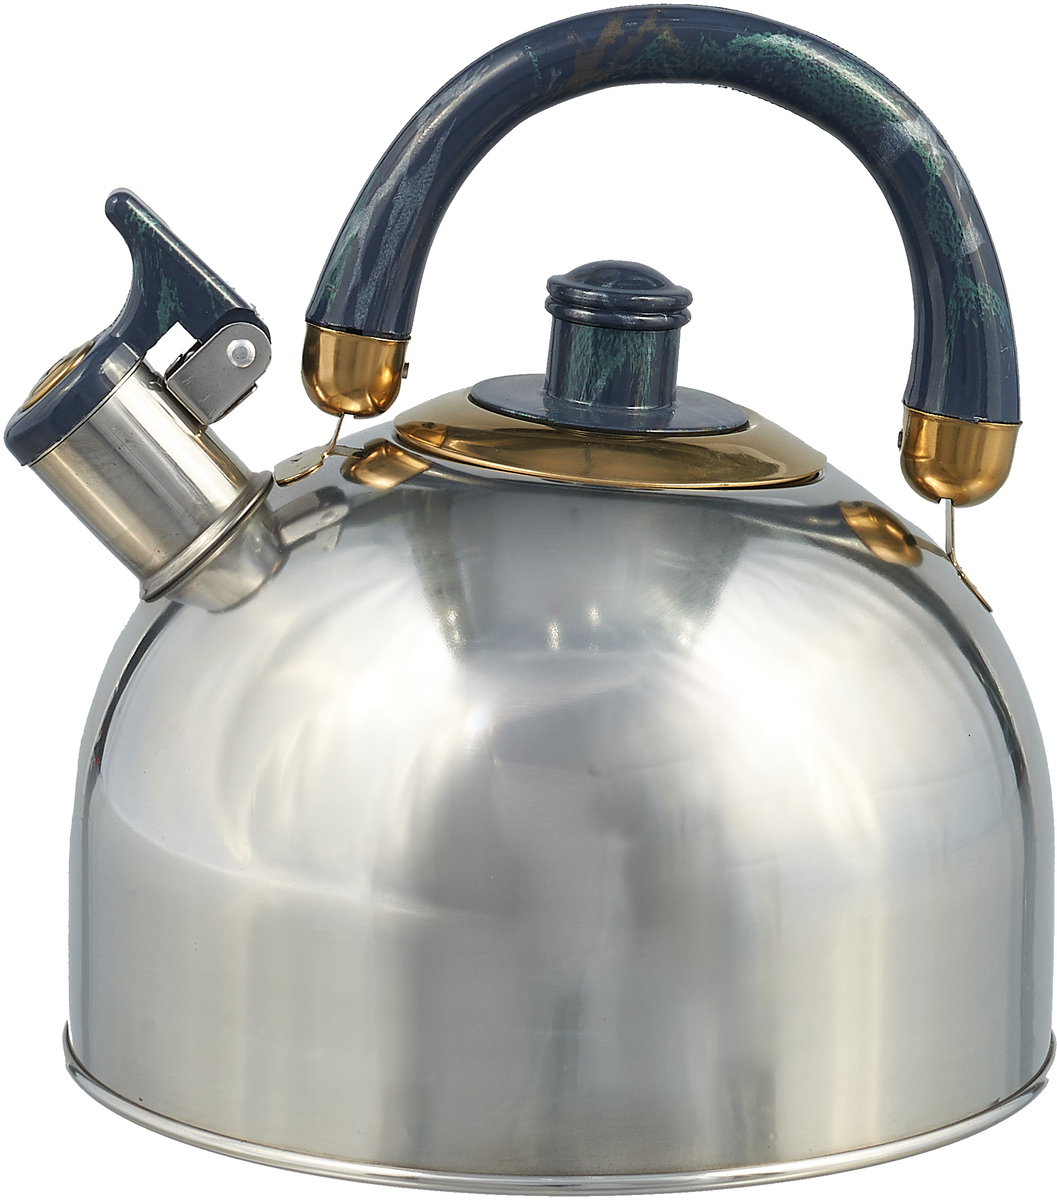 Чайник Rainstahl, со свистком, цвет: темно-синий, 3,5 л